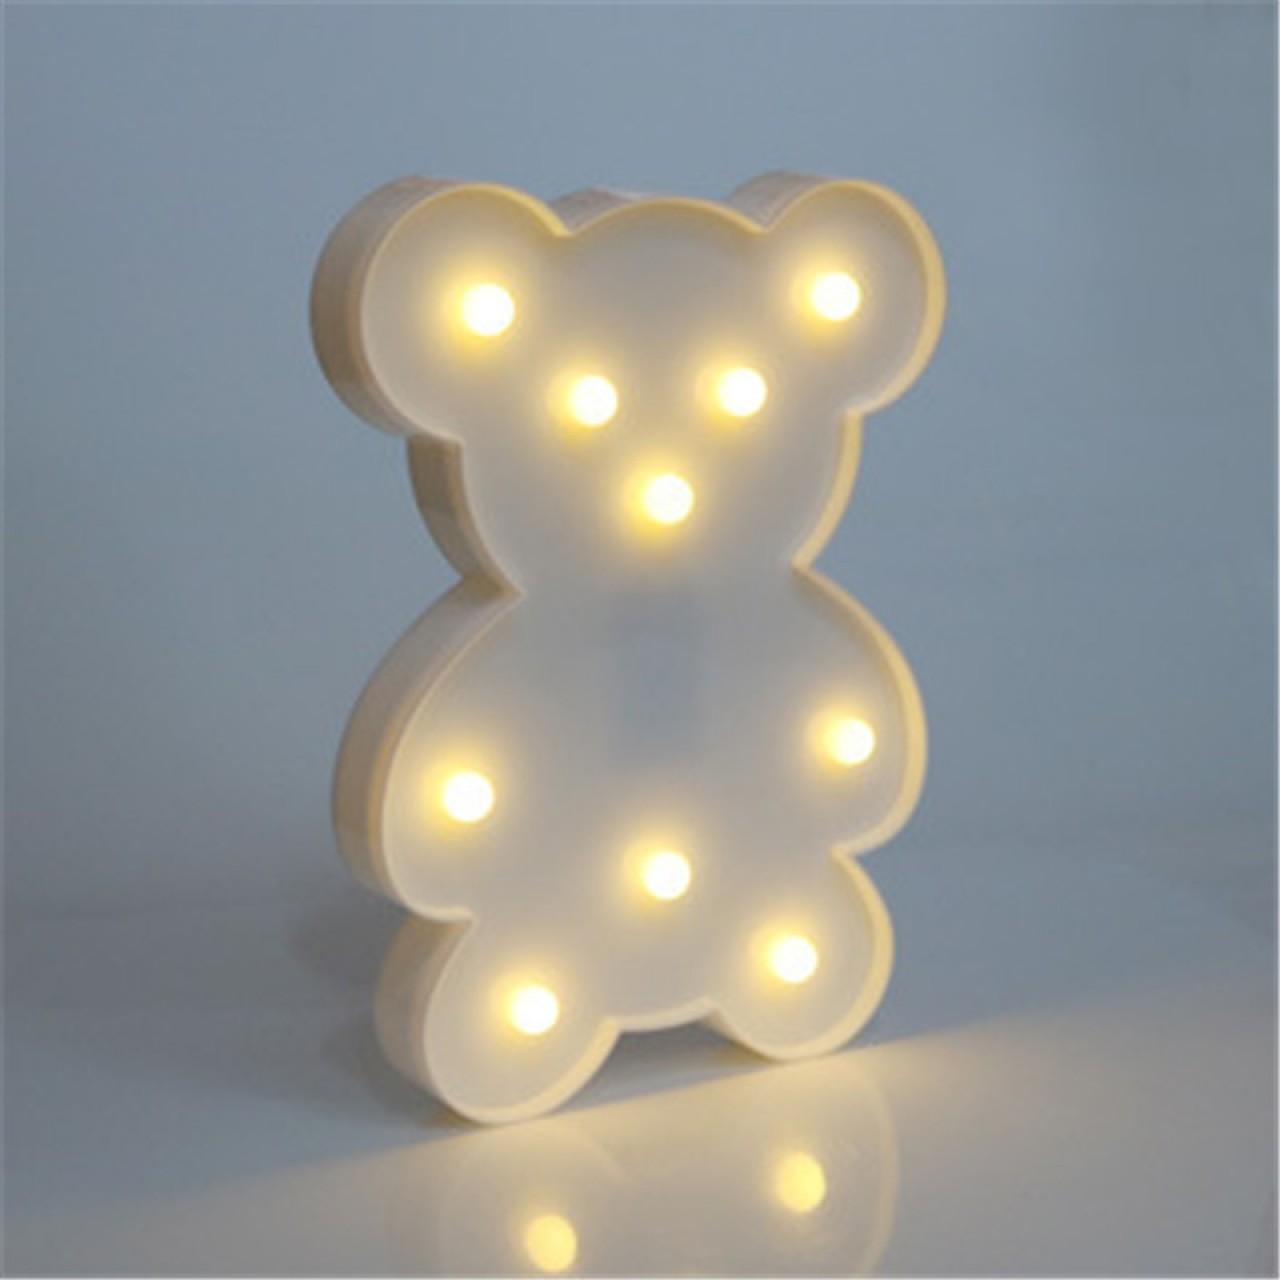 Led светильник Медведь